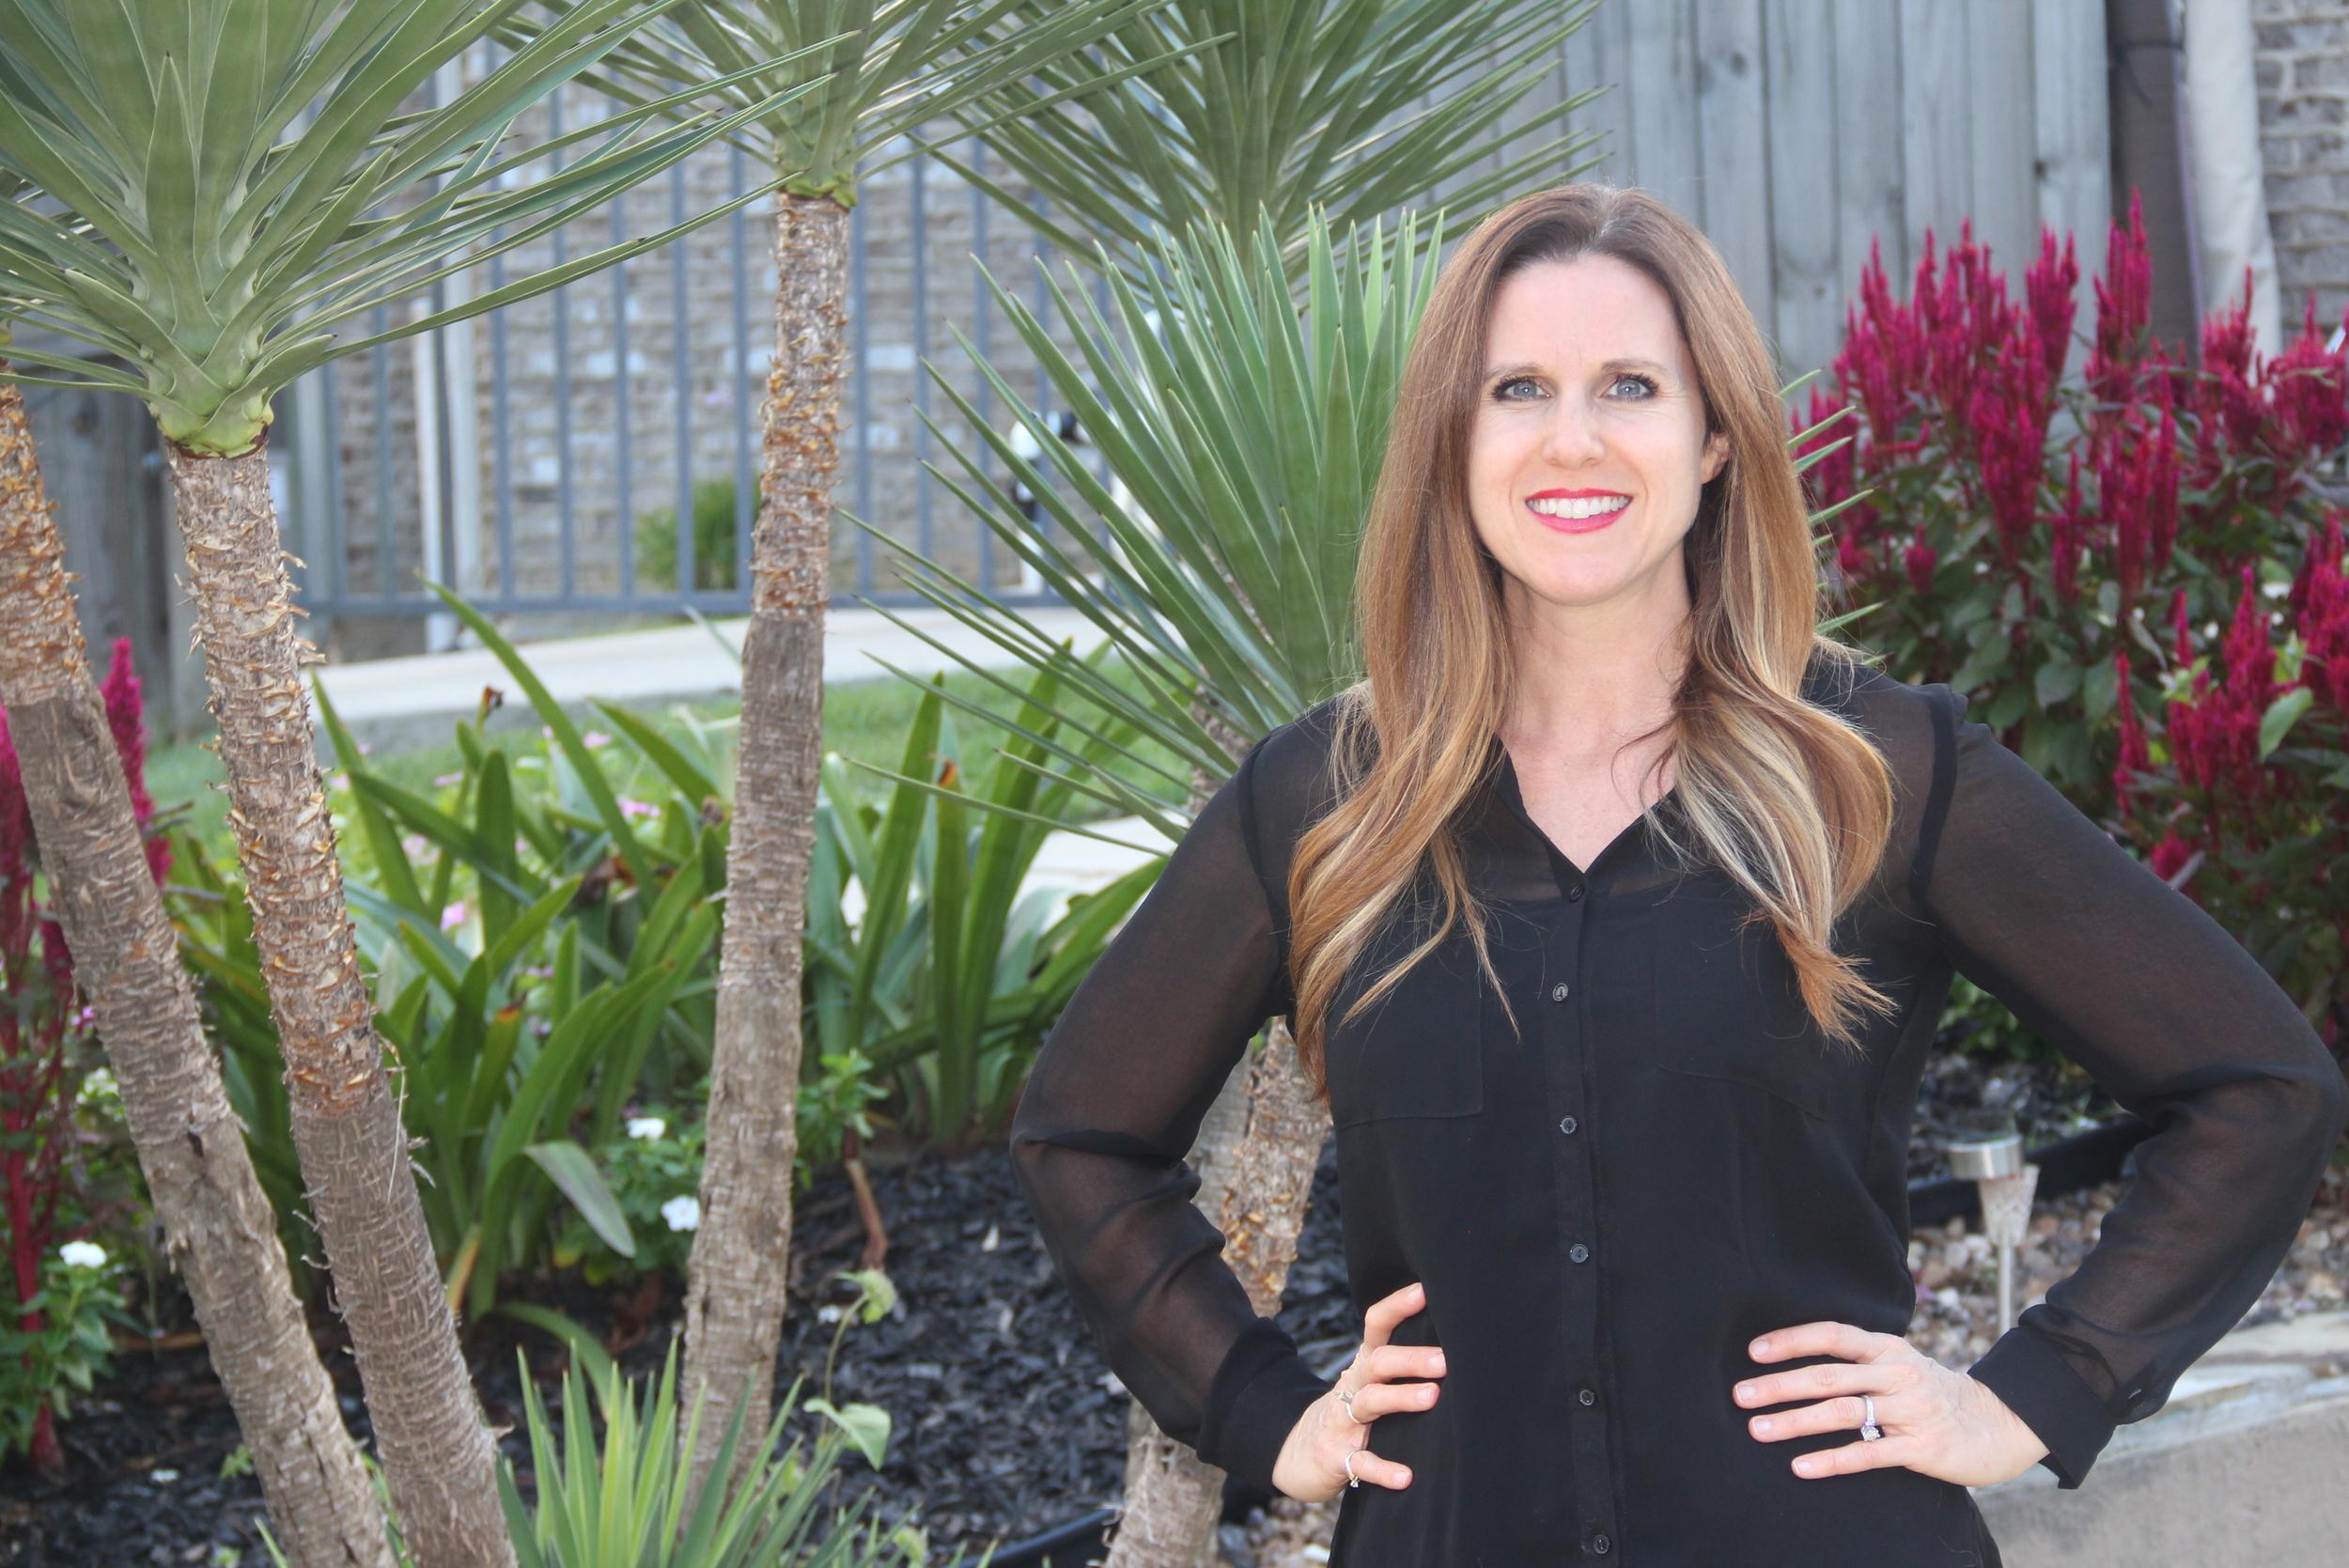 Julie Bridges, Steps of Faith Dance Studio Owner